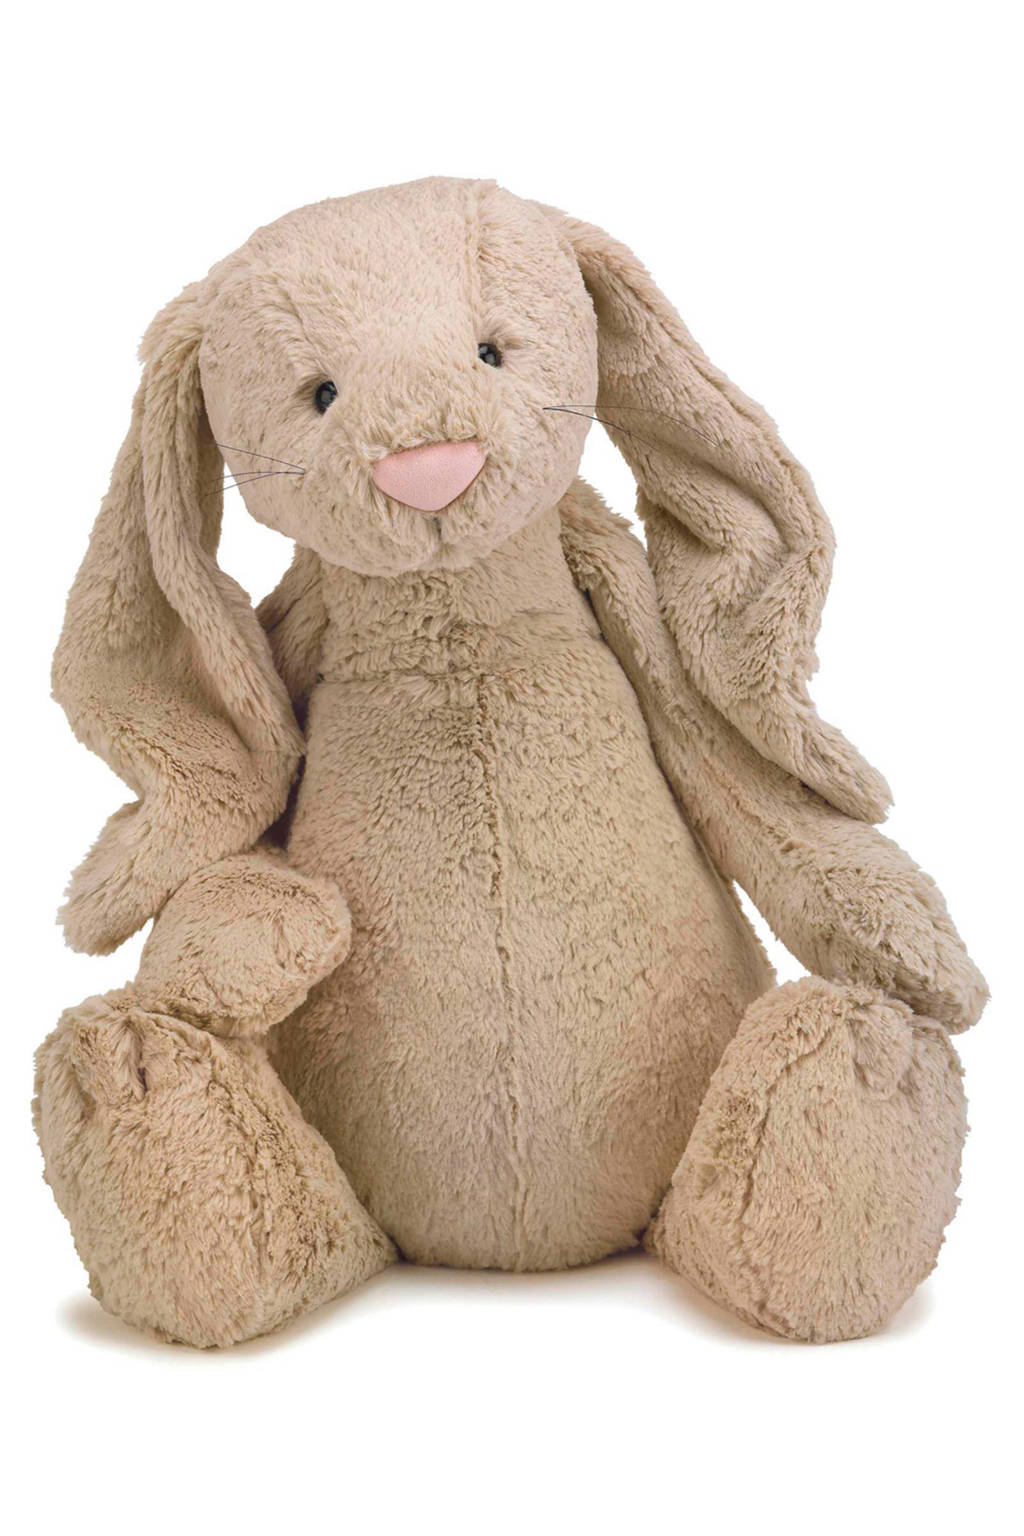 Jellycat Bashful konijn knuffel 36 cm